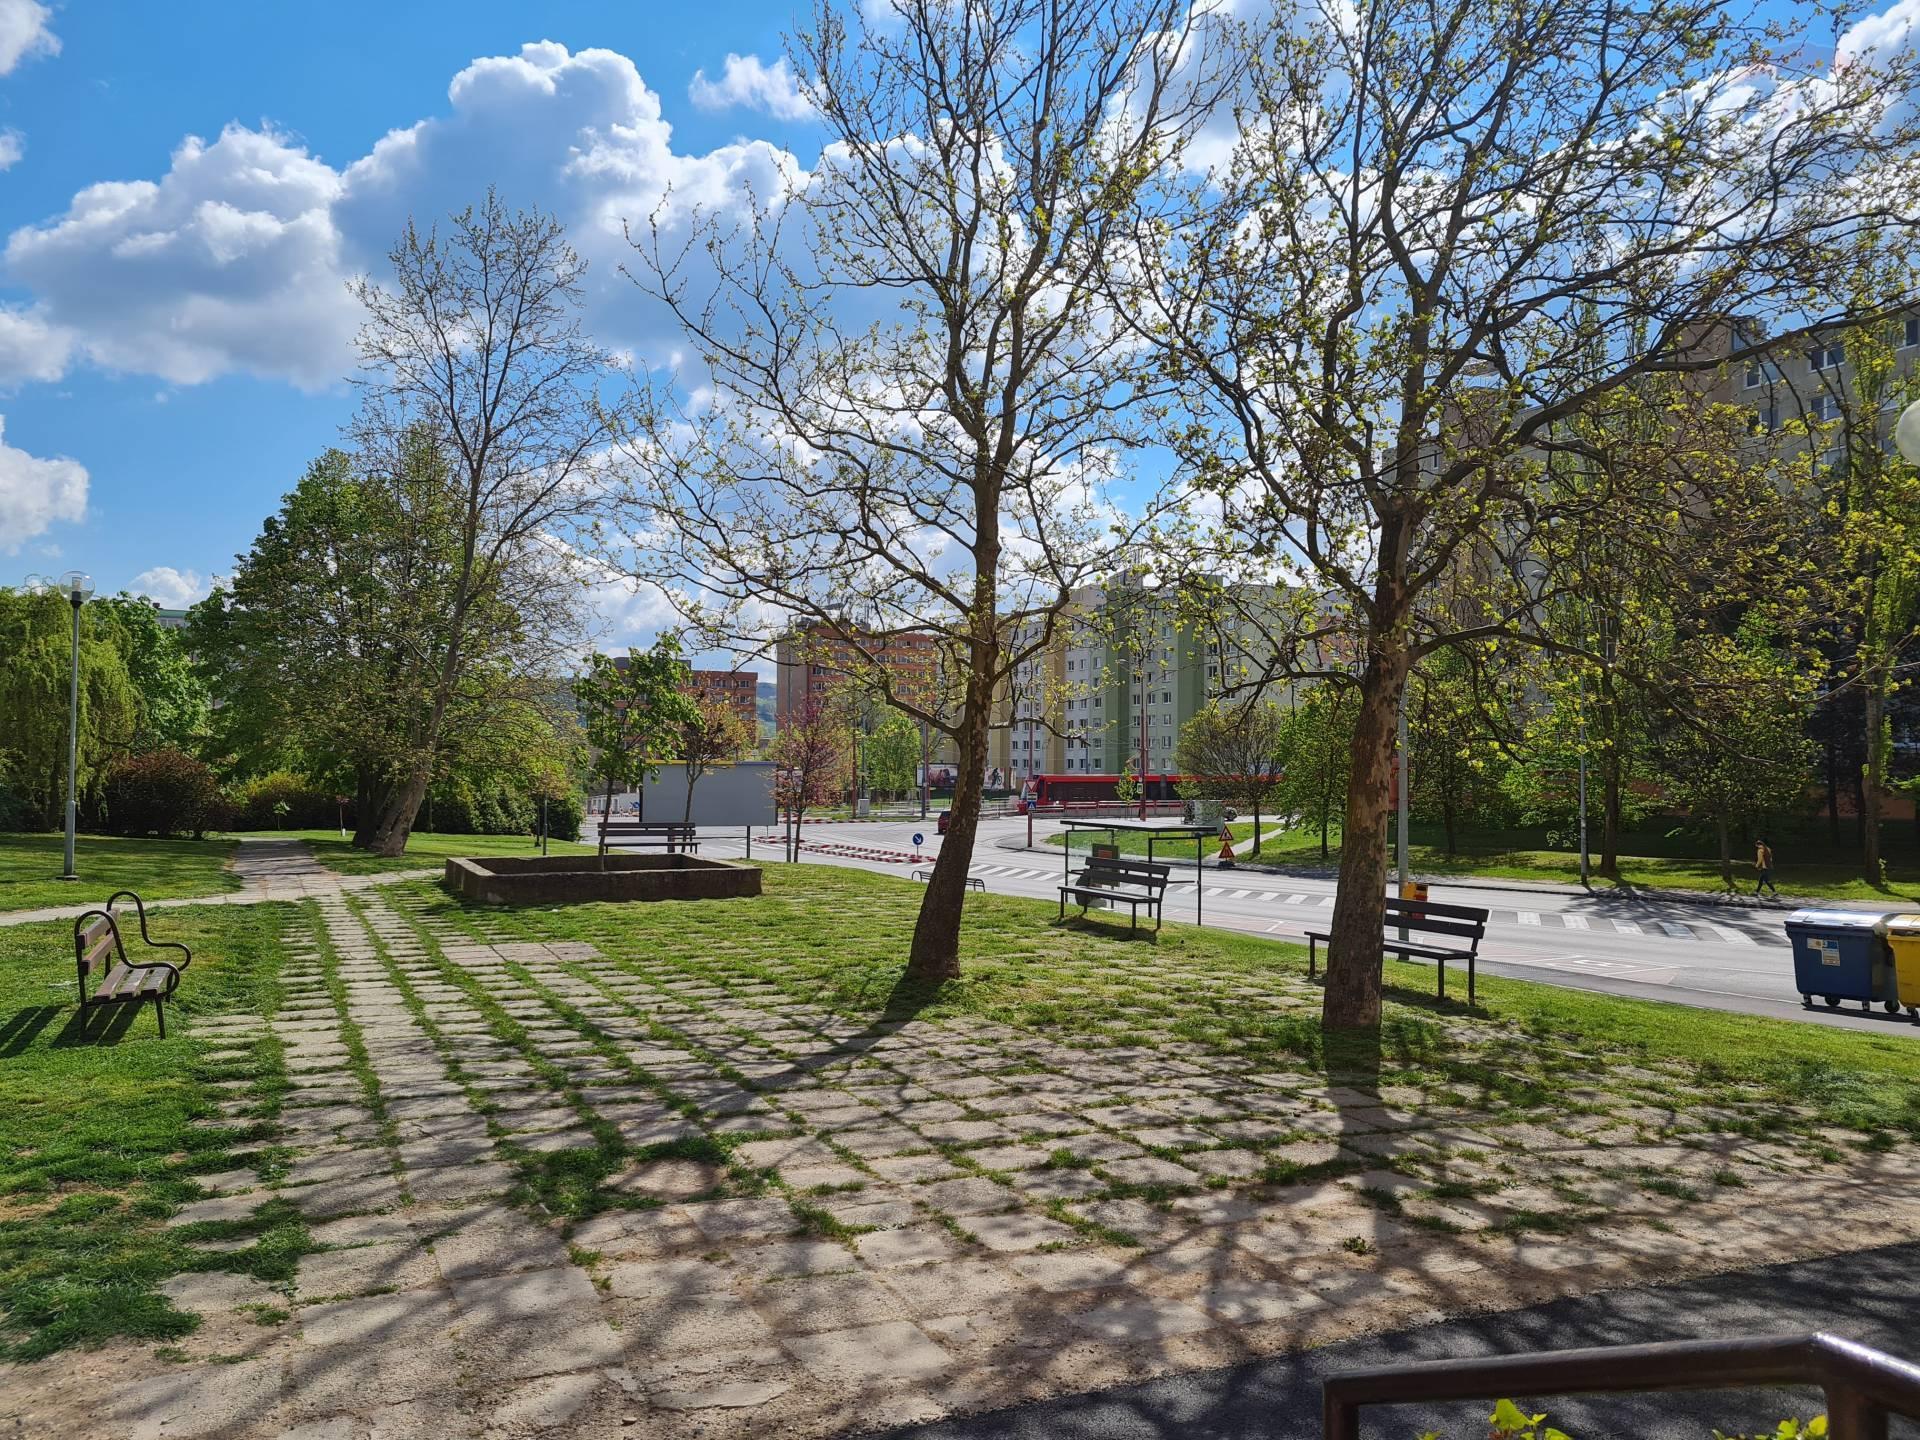 Predaj bytu (3 izbový) 74 m2, Bratislava - Dúbravka -